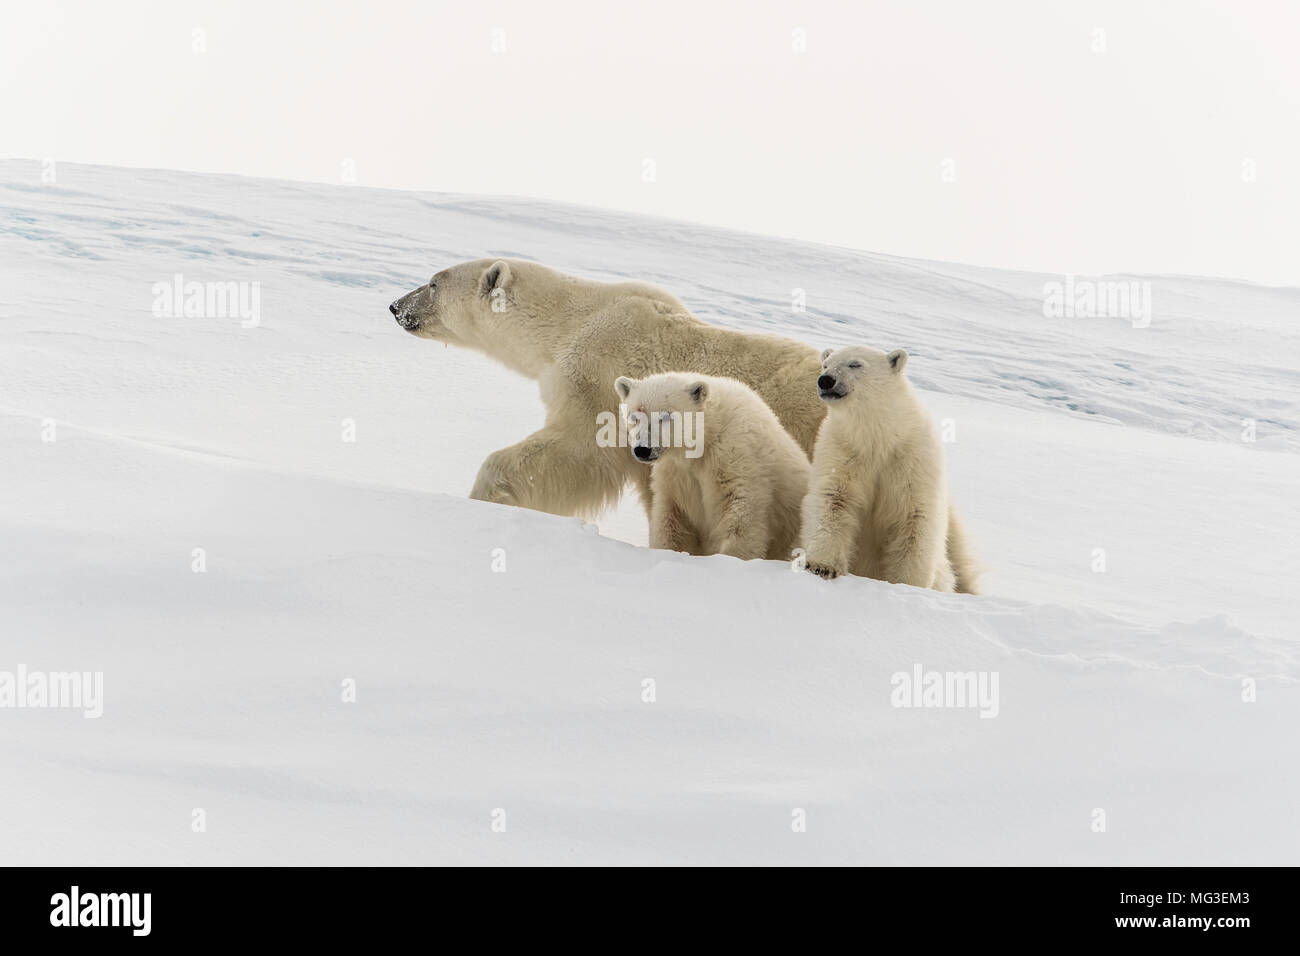 Mother polar bear and yearling cubs walking on an iceberg, Baffin Island, Canada, nunavut, arctic - Stock Image